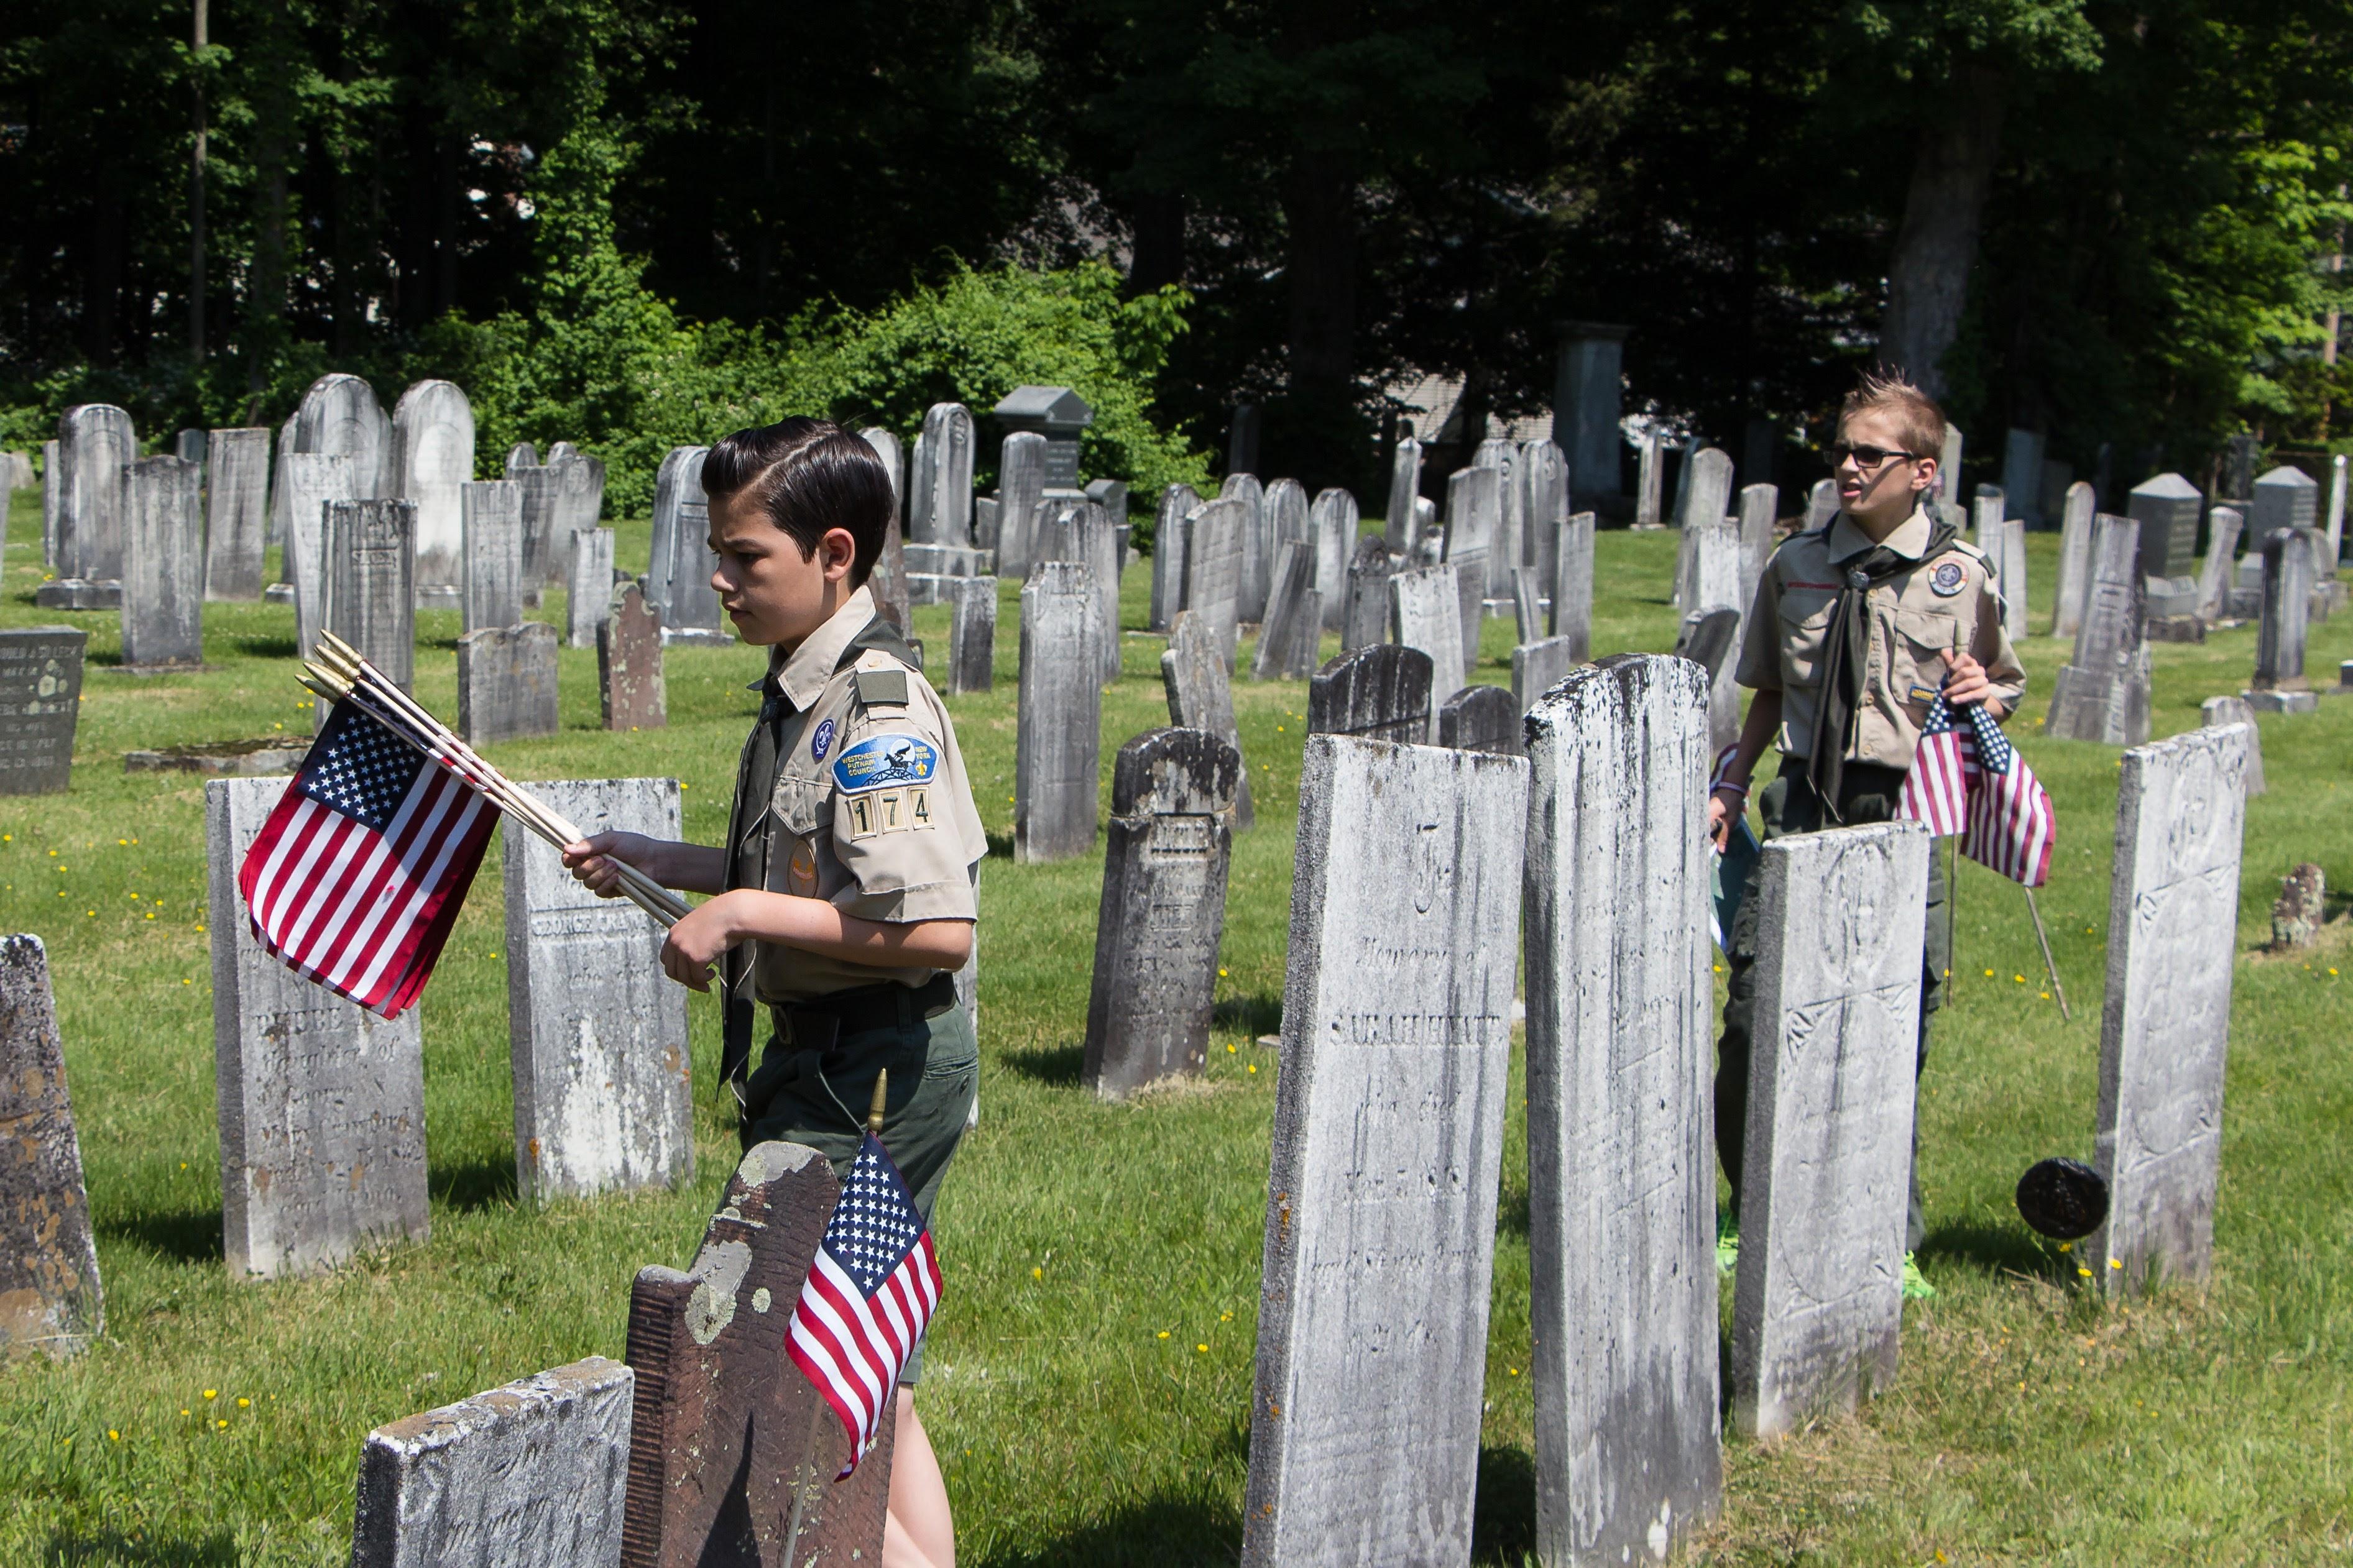 3139fcac581089e158ac_dfc325416c92cfecd01c_20160528_Boy_Scouts_Memorial_Day_Flag_Settng_004.jpg